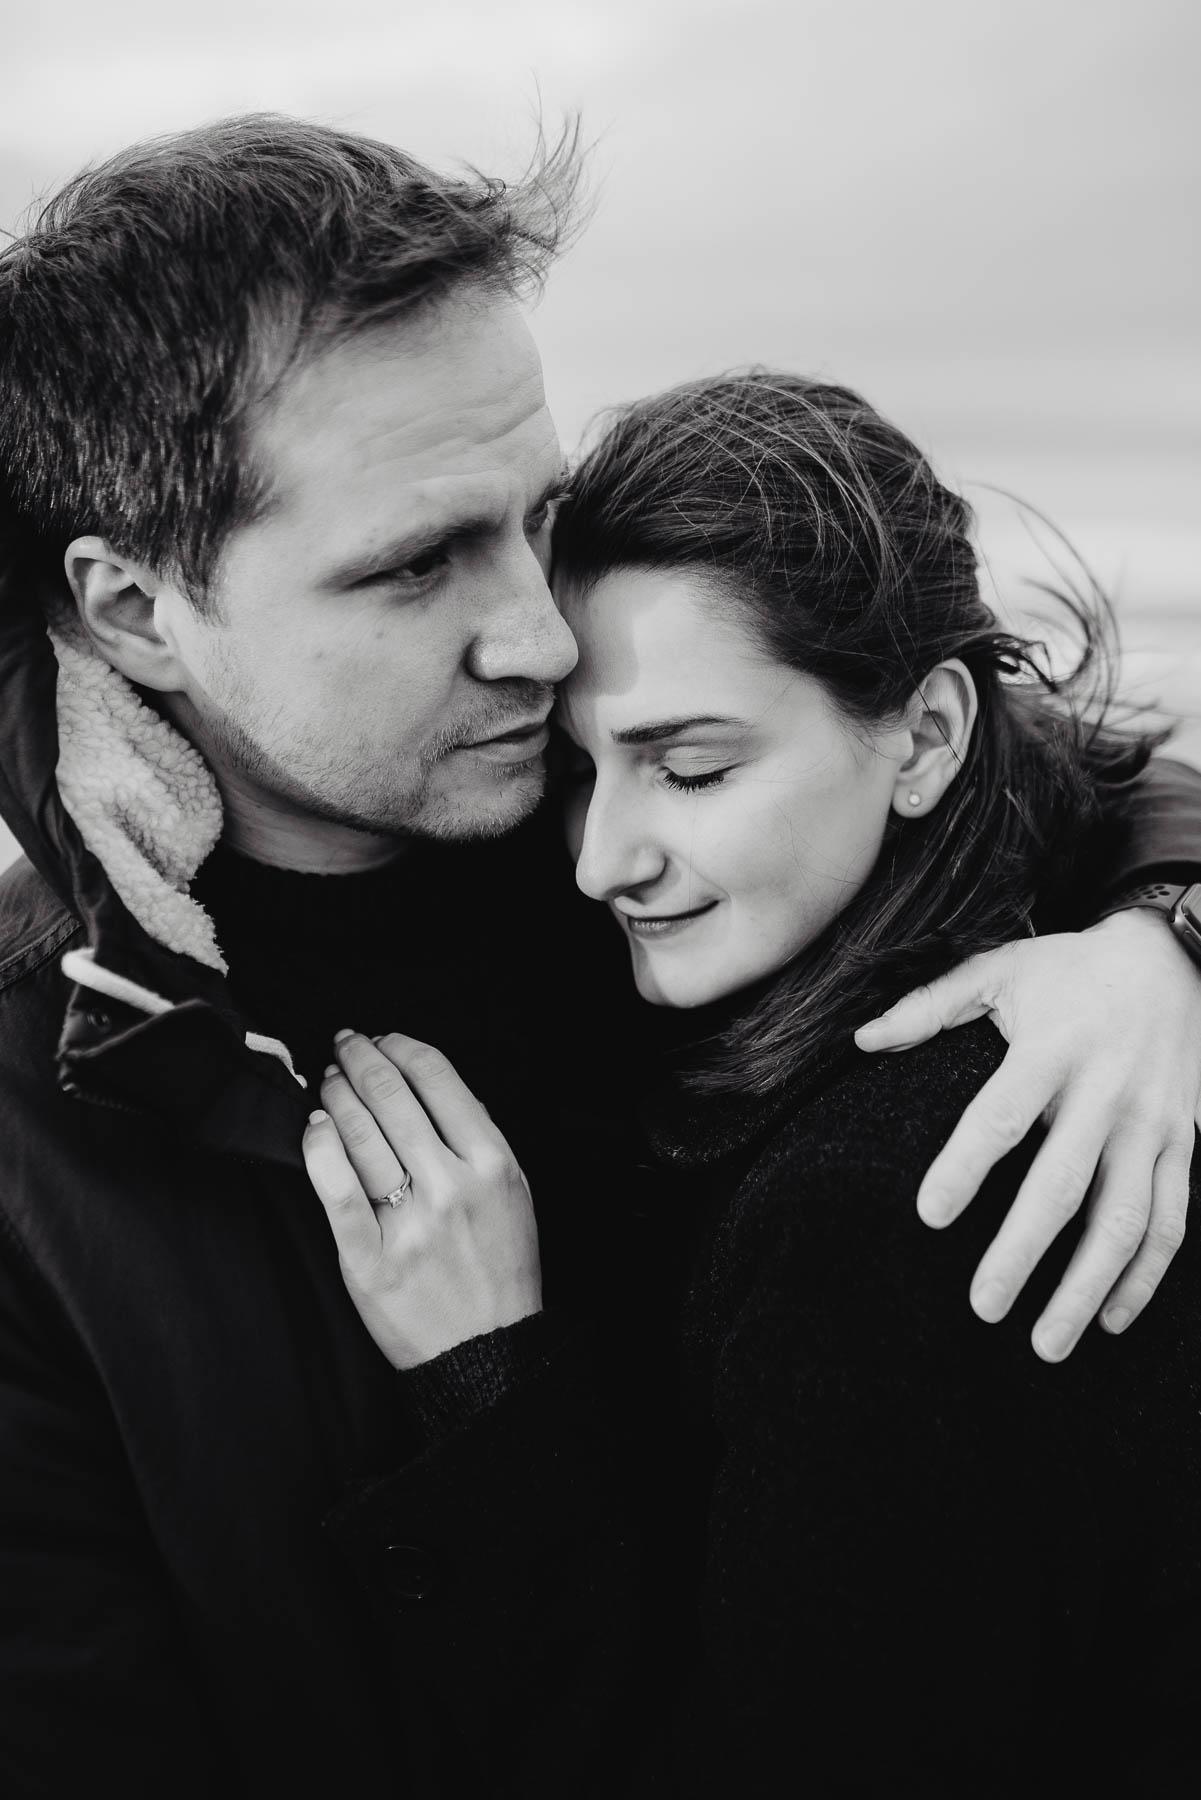 belfast-wedding-engagement-photography-7.jpg